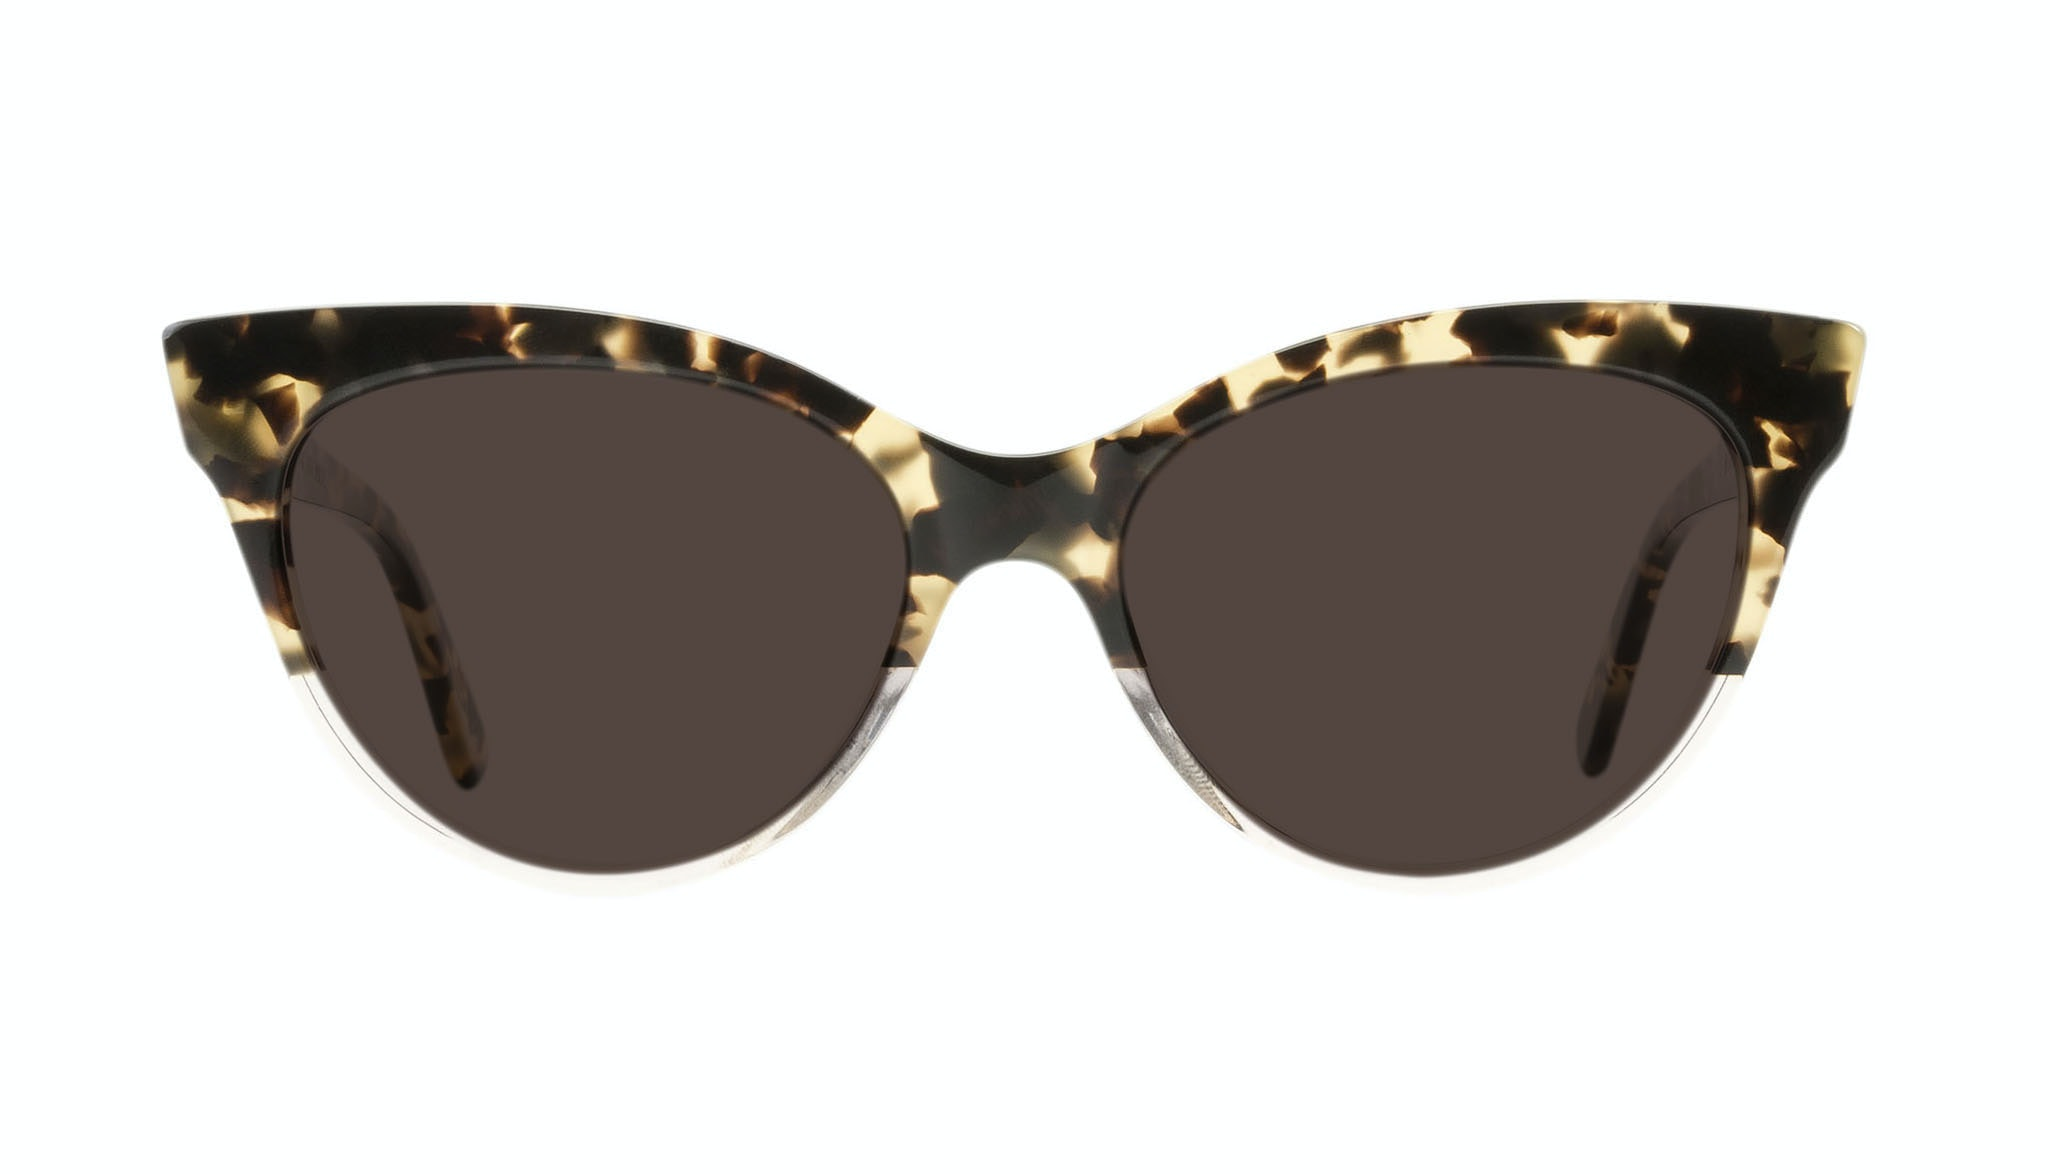 Affordable Fashion Glasses Cat Eye Sunglasses Women SkunkBoy Champagne Tort Front